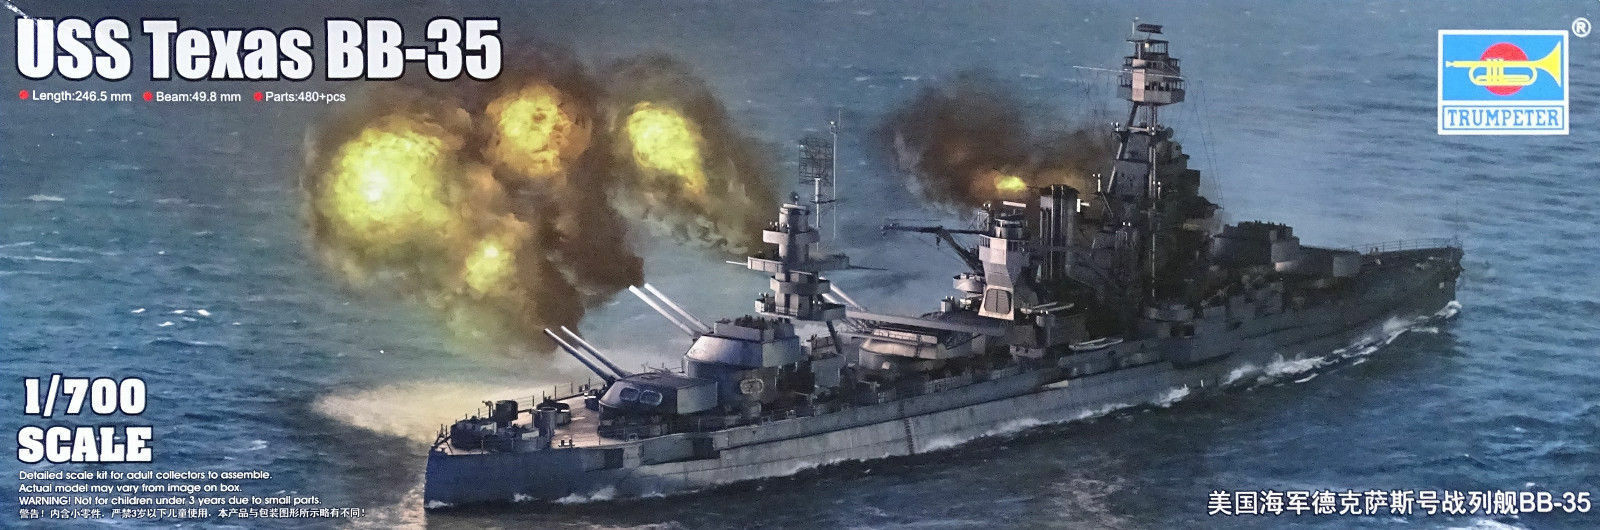 Trumpeter Uss u. S. S. Texas Bb-35 Kit 1 700 Model Set Item 06712 Battle Ship